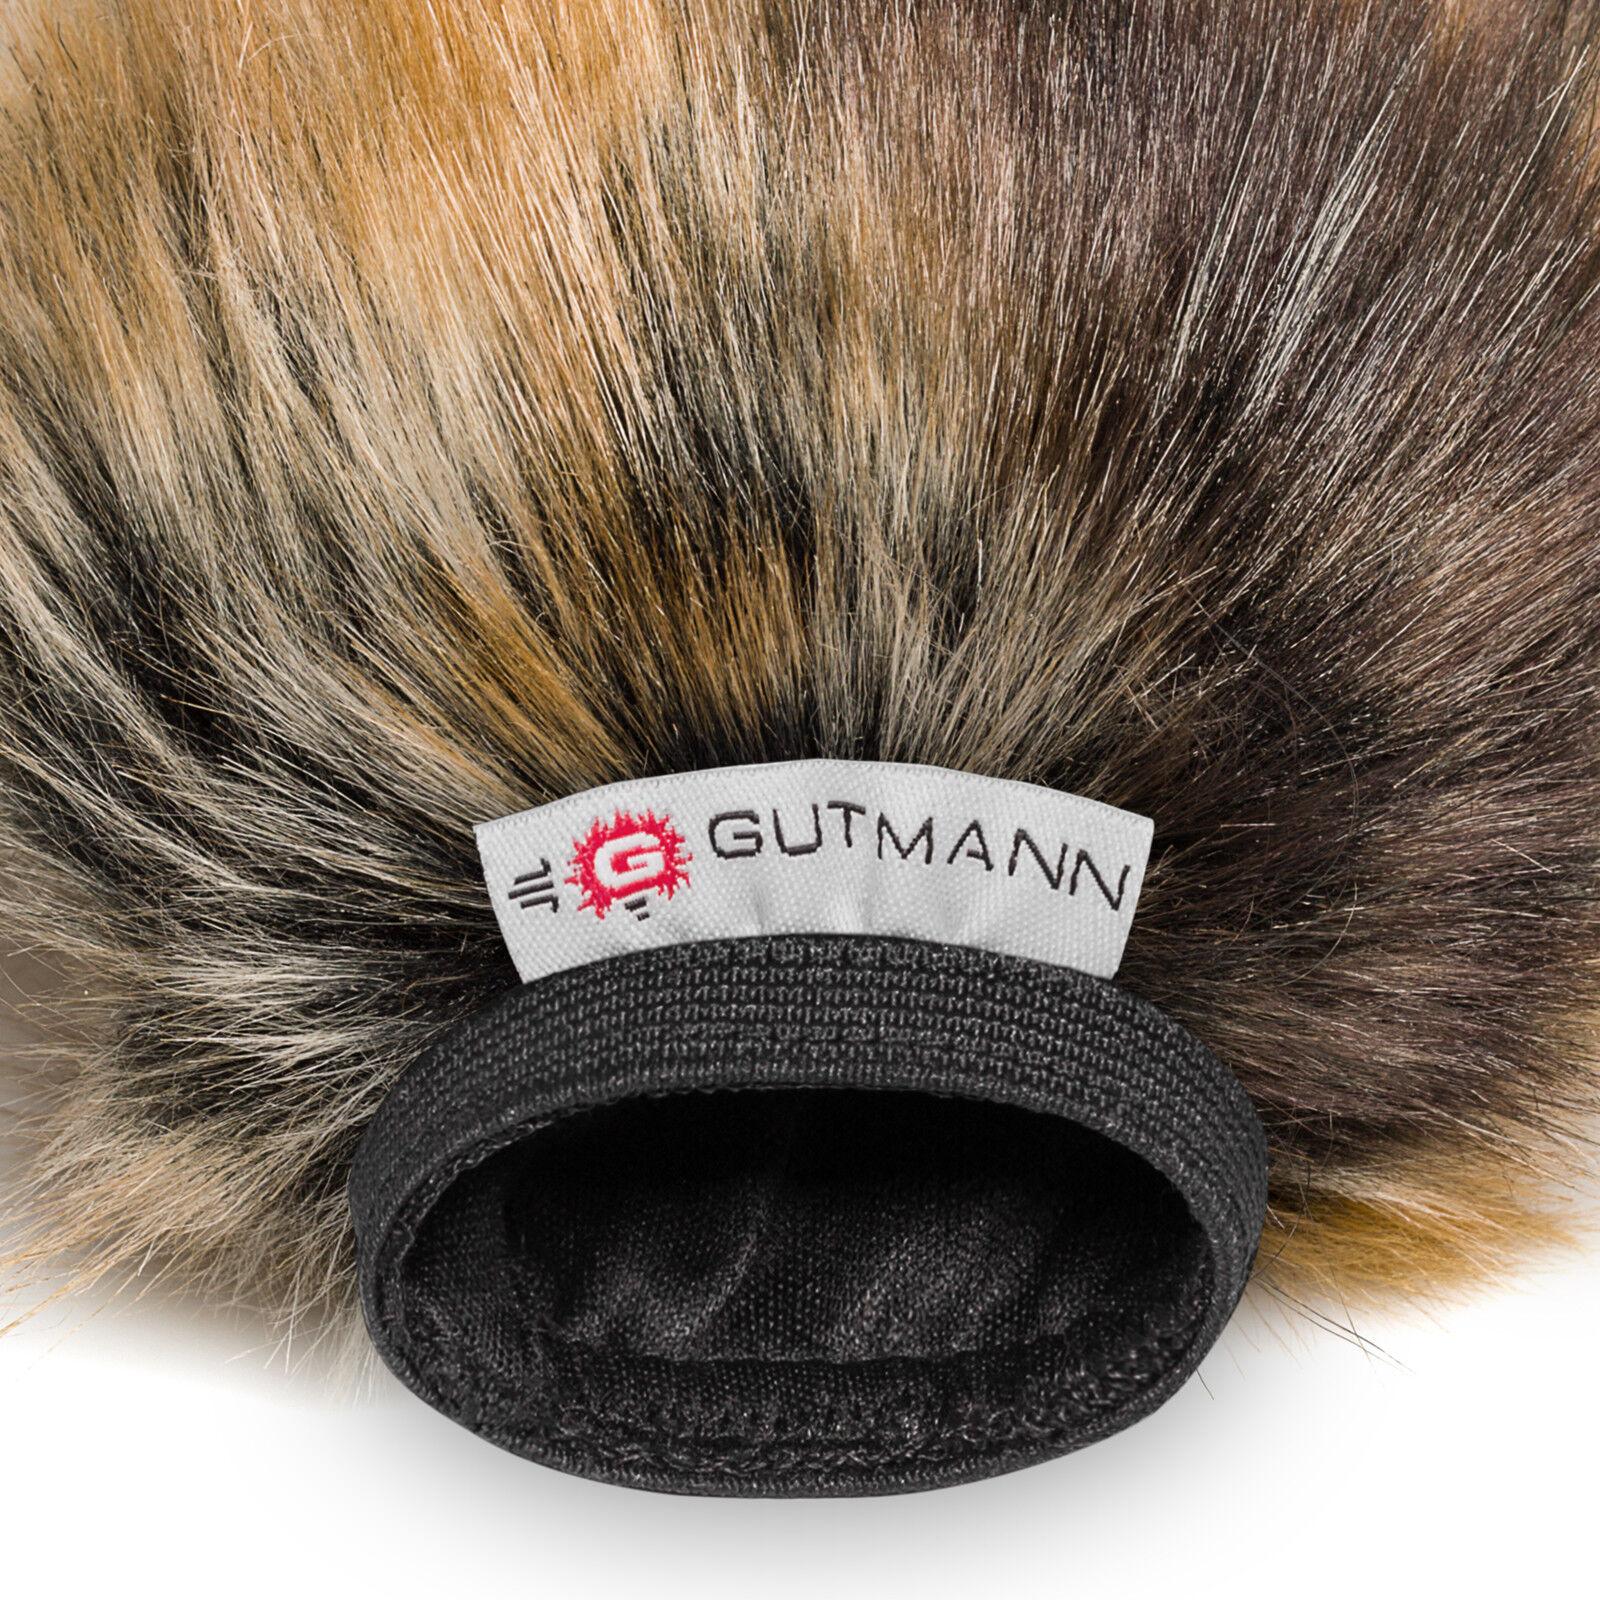 Gutmann Gutmann Gutmann Micrófono Parabrisas Parabrisas Para Olympus LS-3 Premium Edition Tiger 1359f7